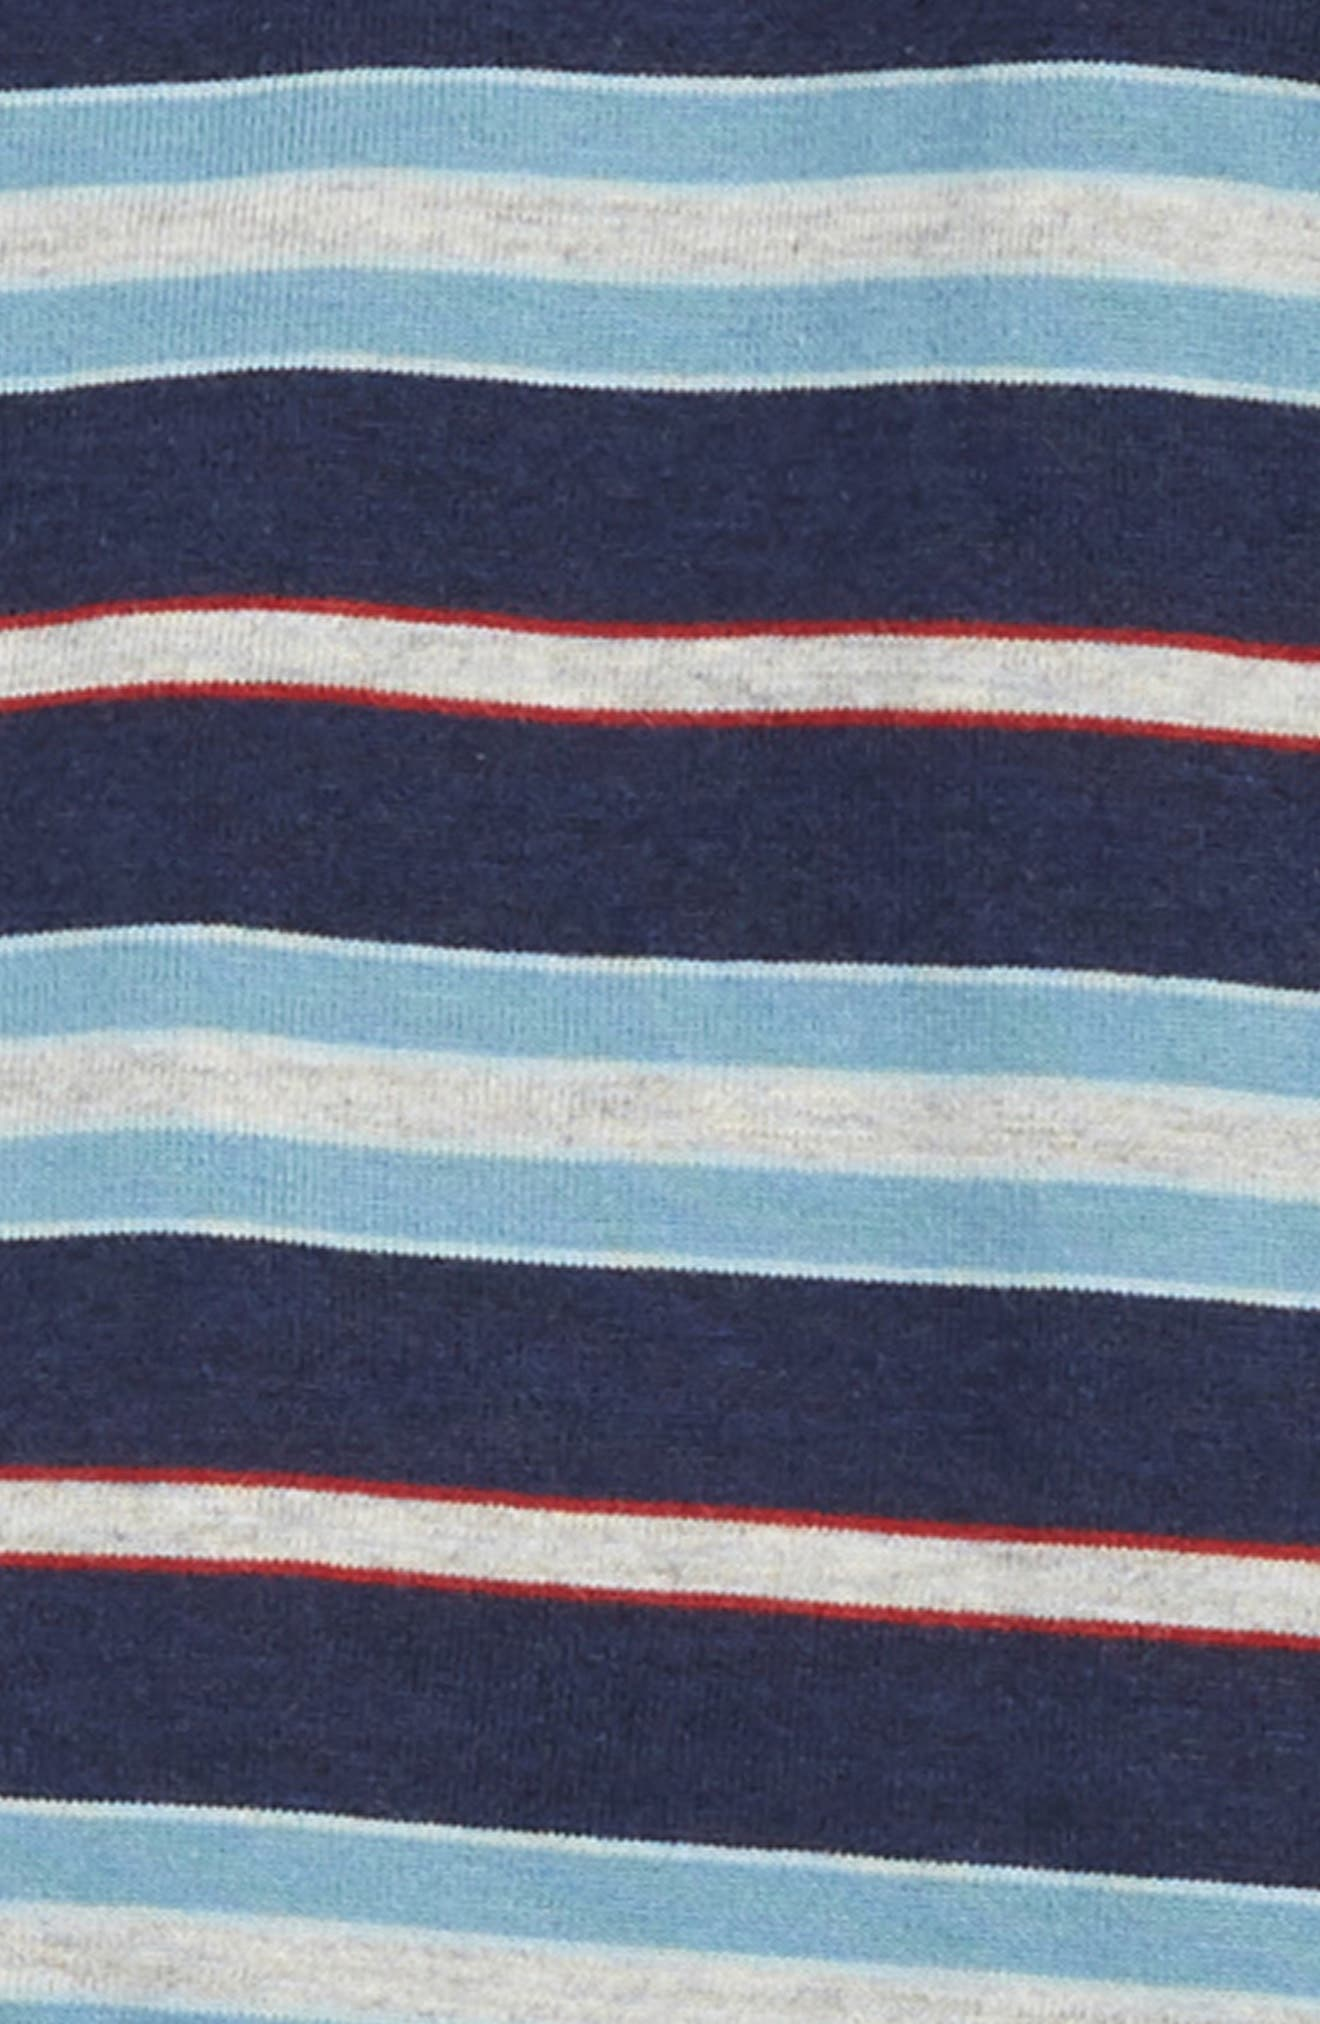 Stripe Top & Sweatpants Set,                             Alternate thumbnail 2, color,                             051